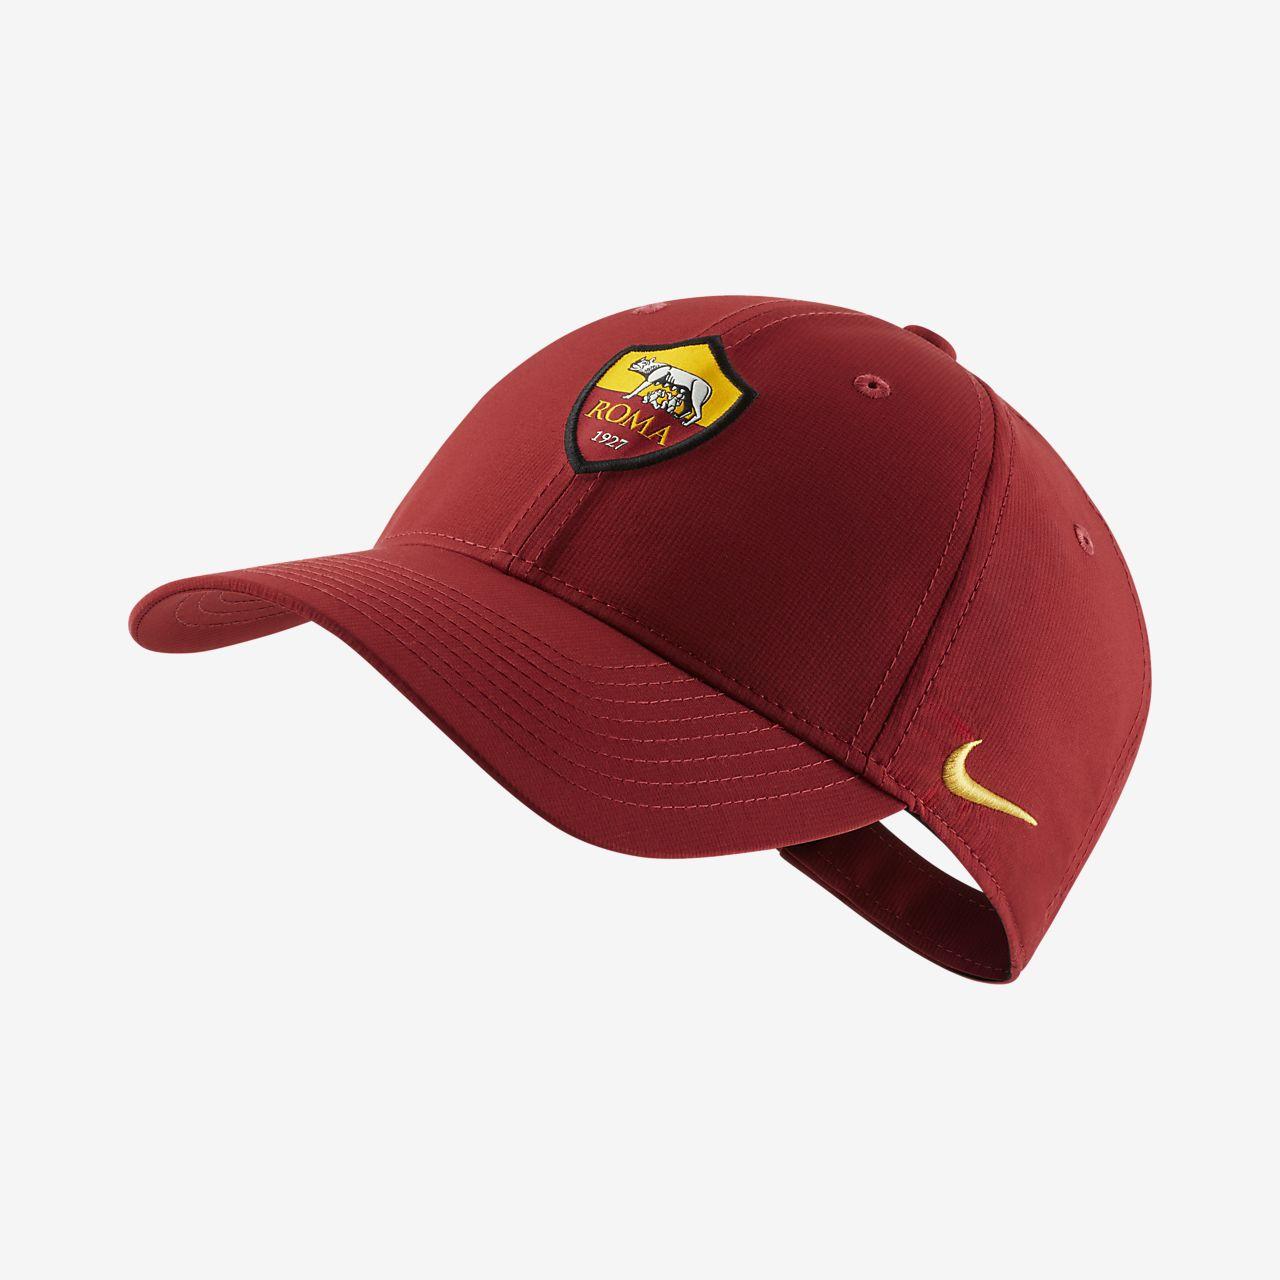 Gorra ajustable Nike Dri-FIT A.S. Roma Legacy91